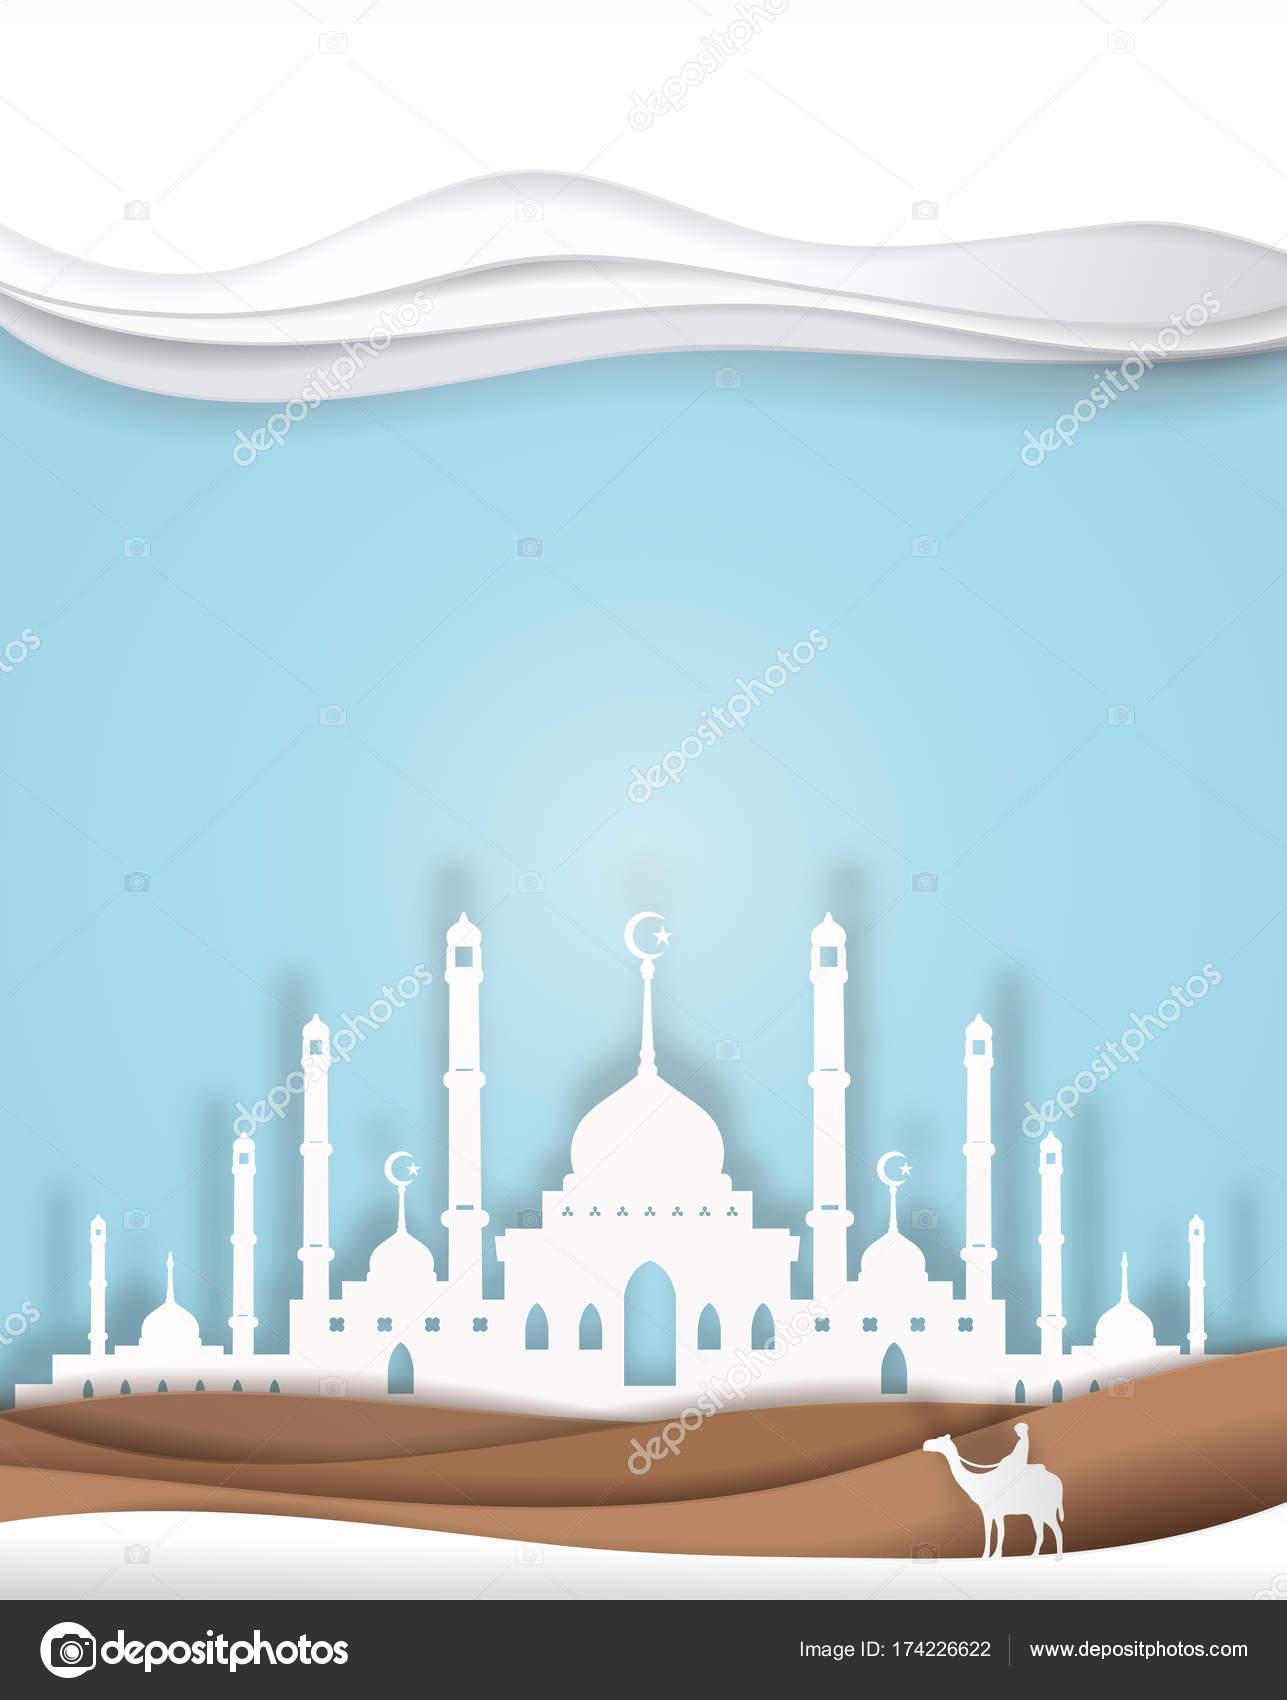 Gambar Masjid Untuk Logo : gambar, masjid, untuk, Camel, Front, Masjid, Background, Vector, Paper, Image, Gmm2000, Stock, 174226622